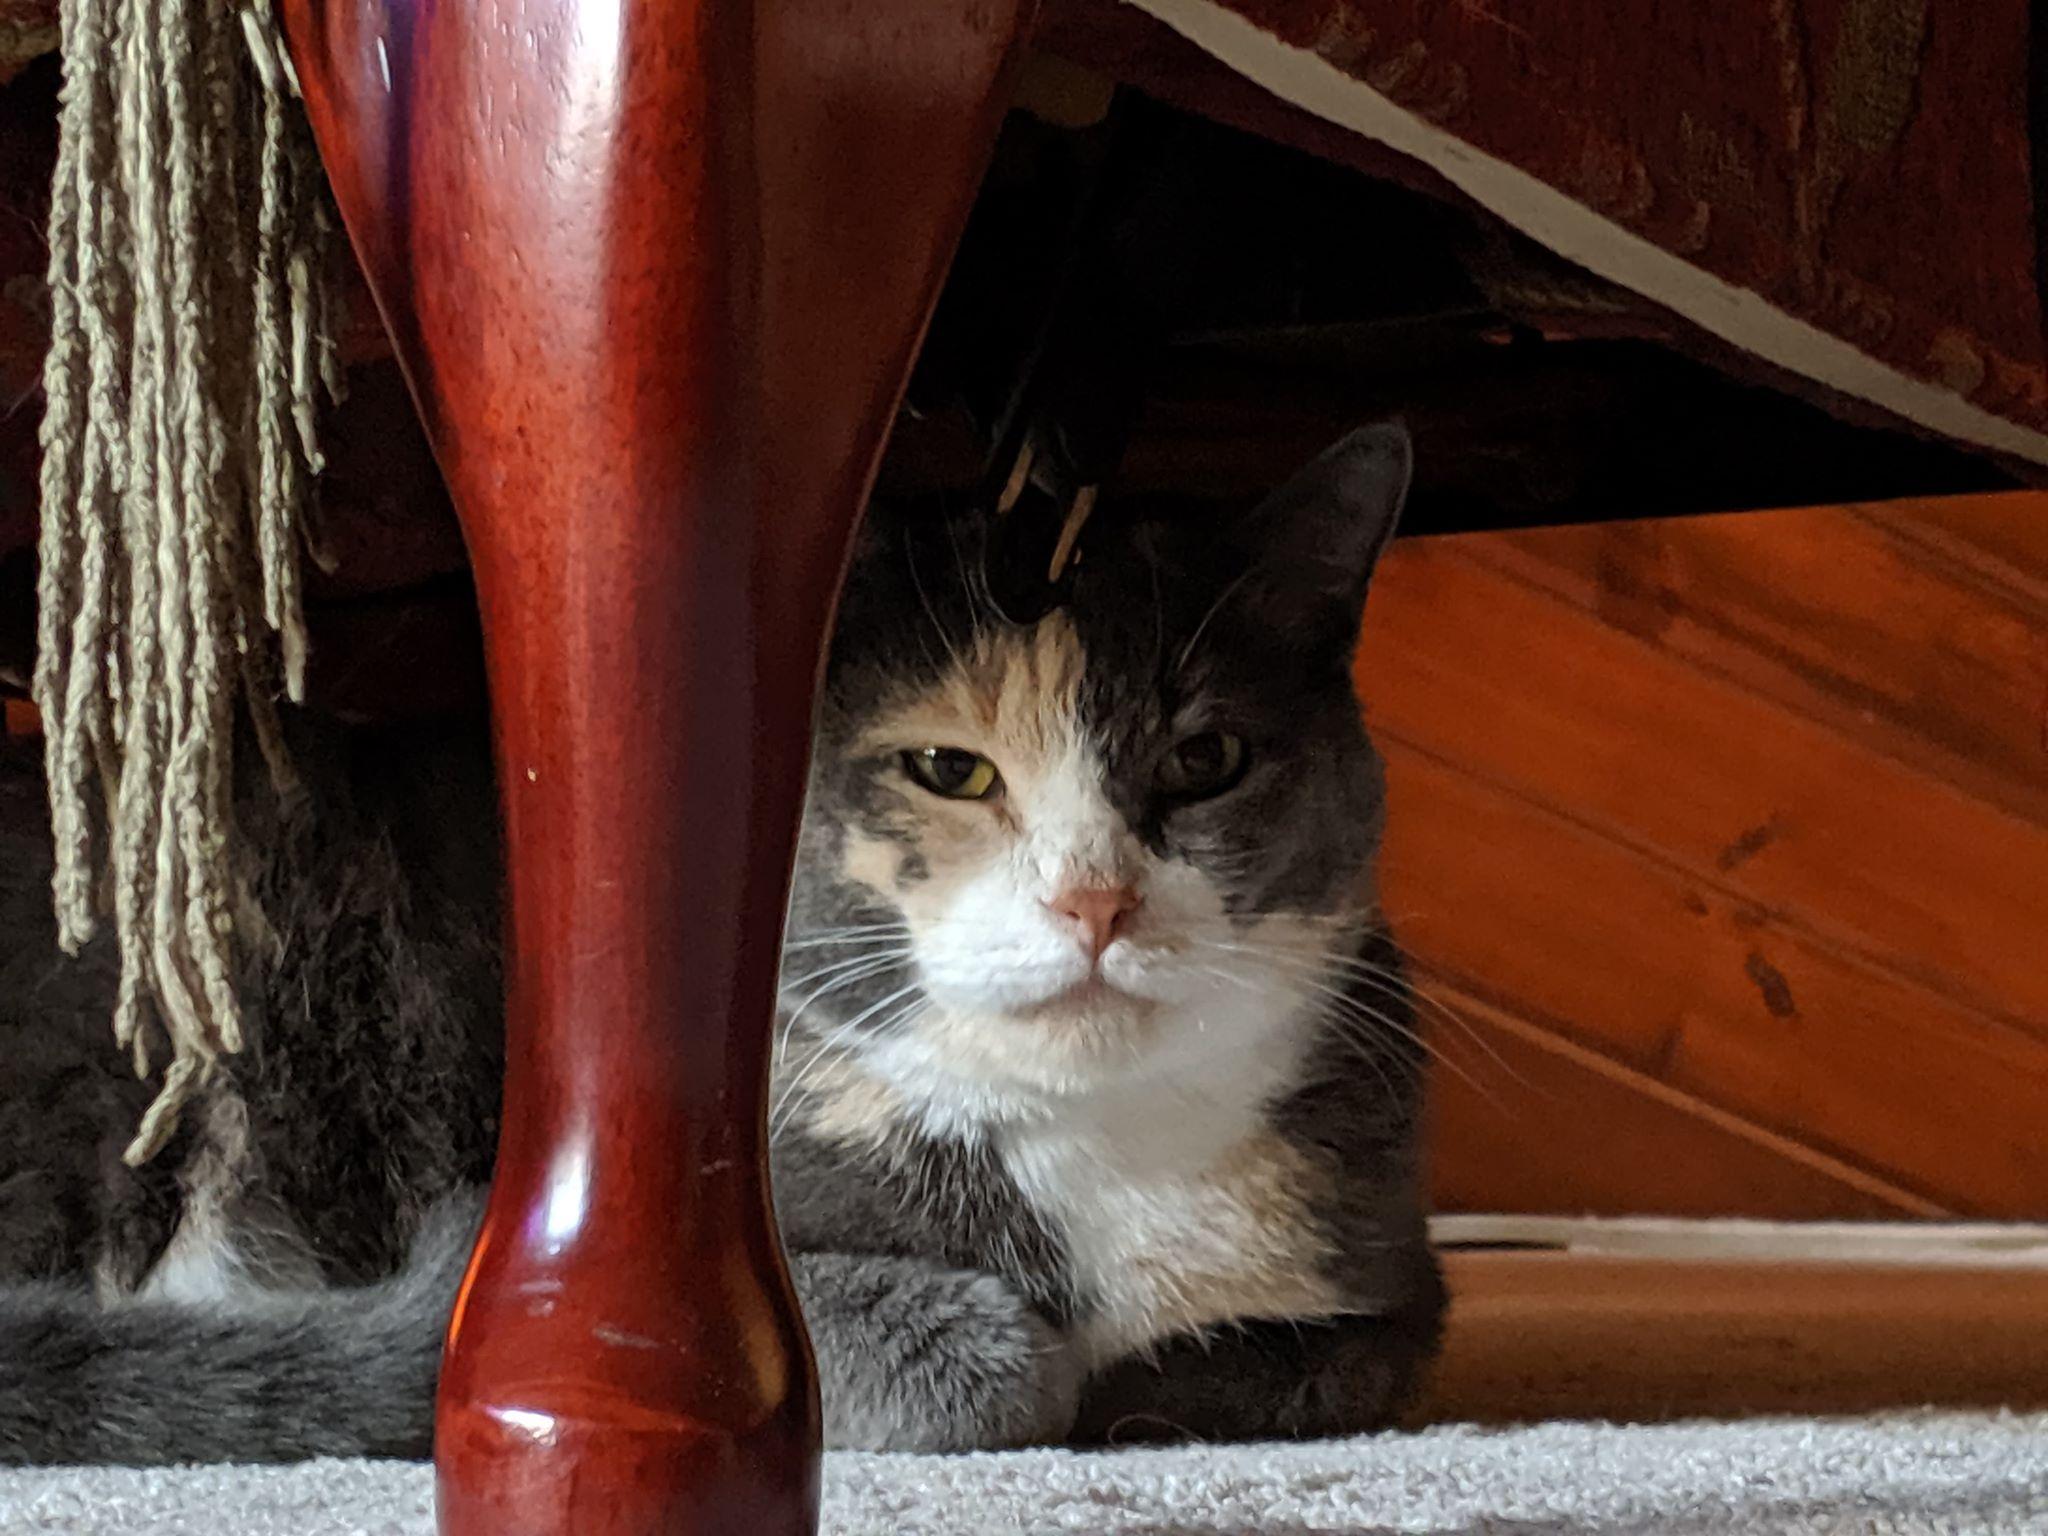 Peppernut under chair